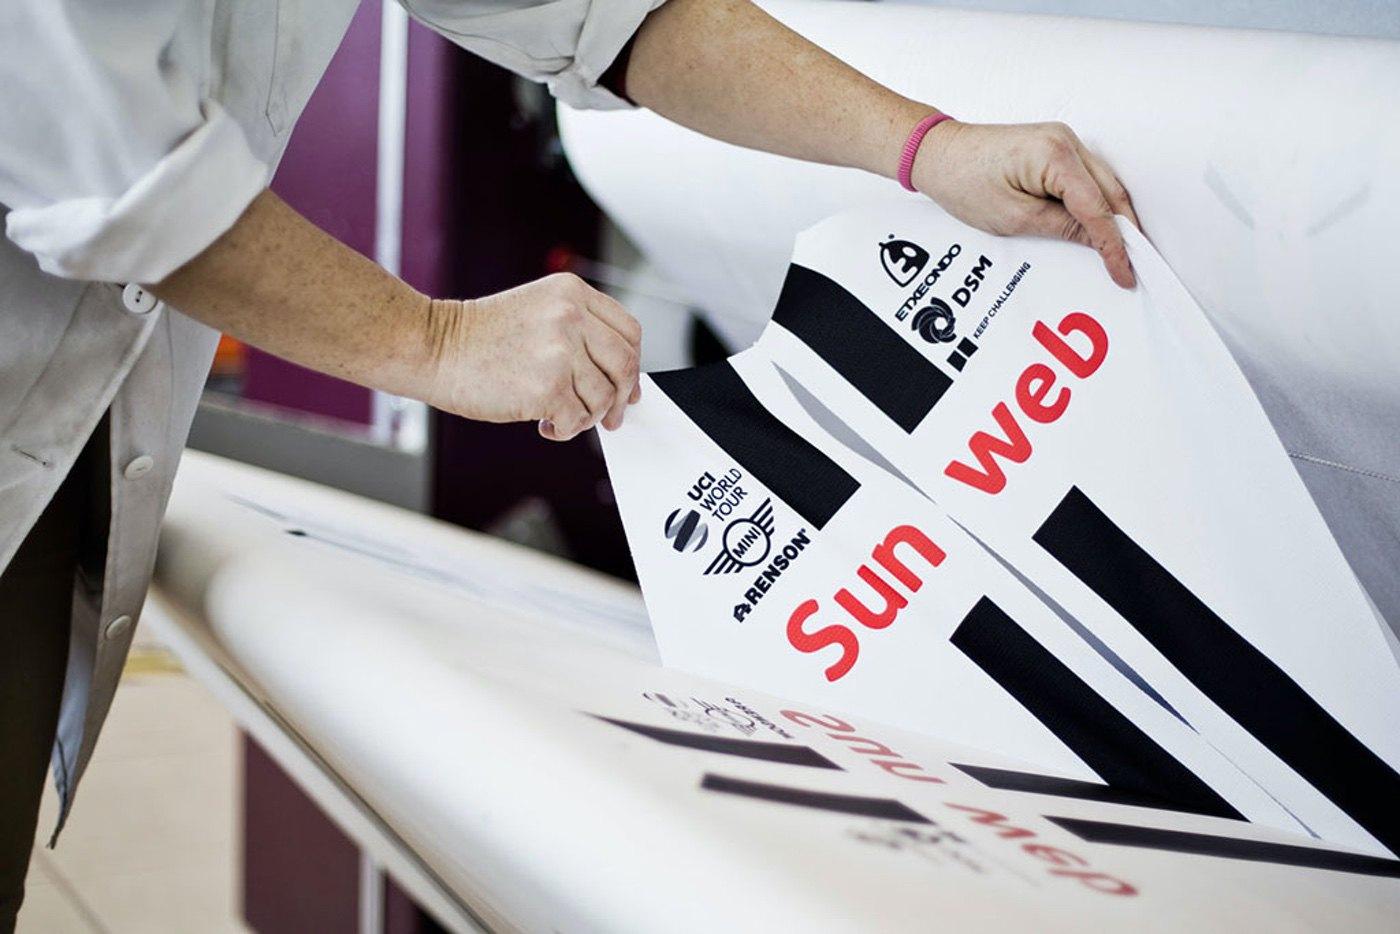 El Team Sunweb vestirá ropa Etxeondo